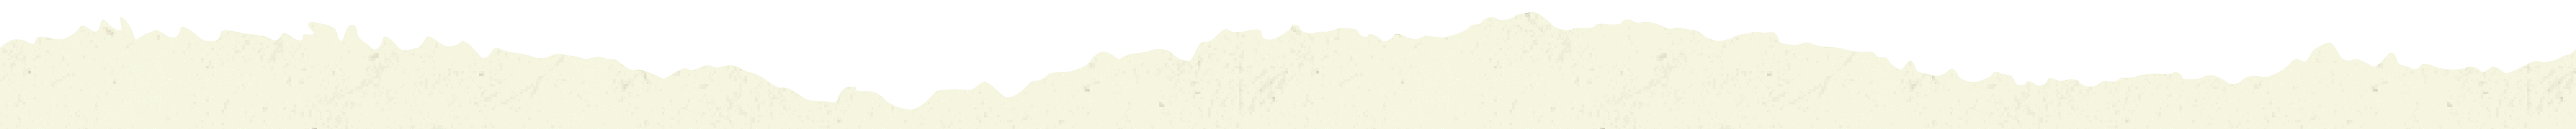 paper-divider-top-1@2x